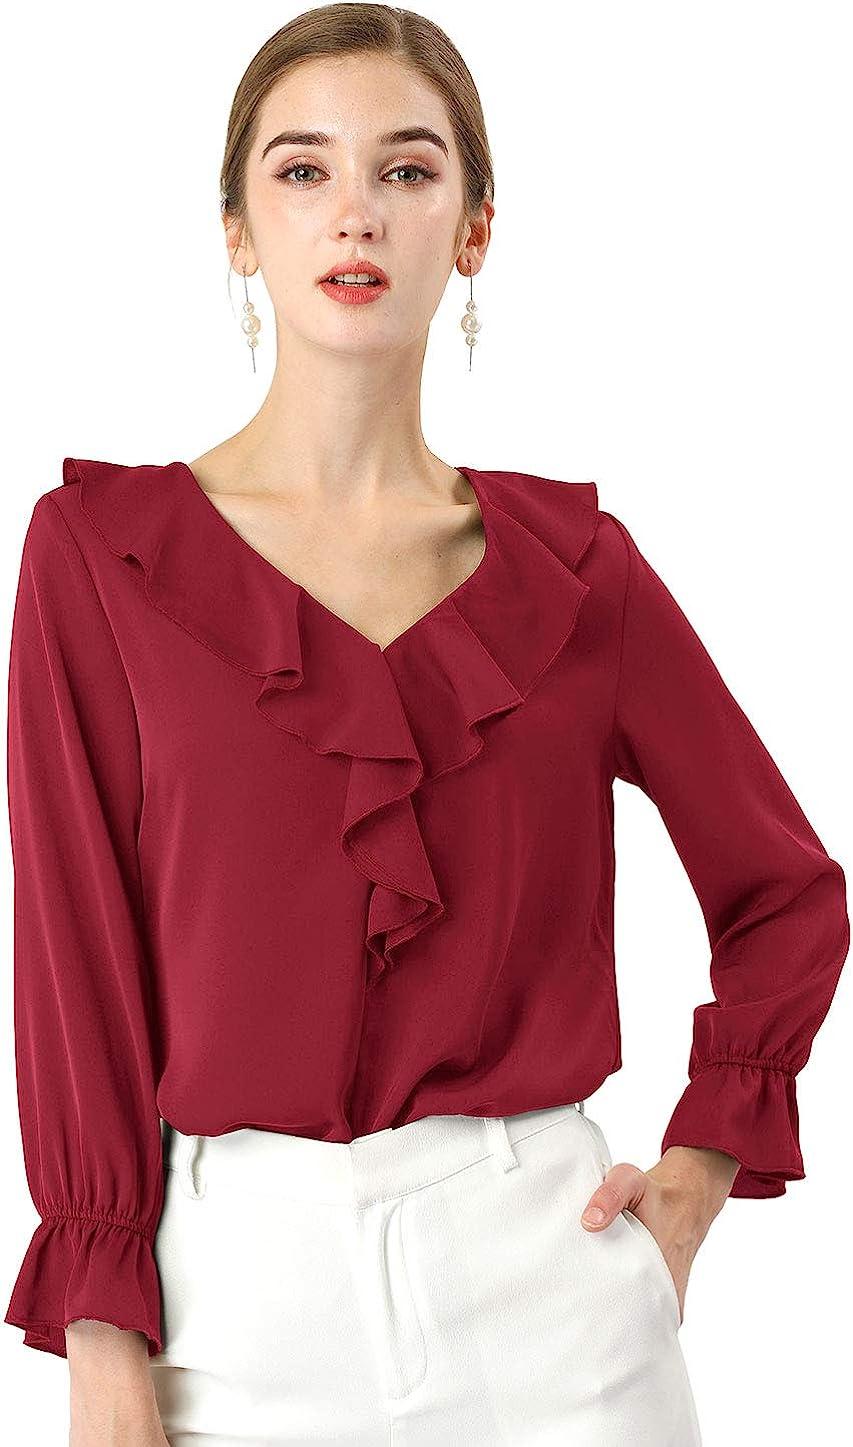 Allegra K Women's Peasant Top Office Work Chiffon Ruffle Neck Vintage Blouse